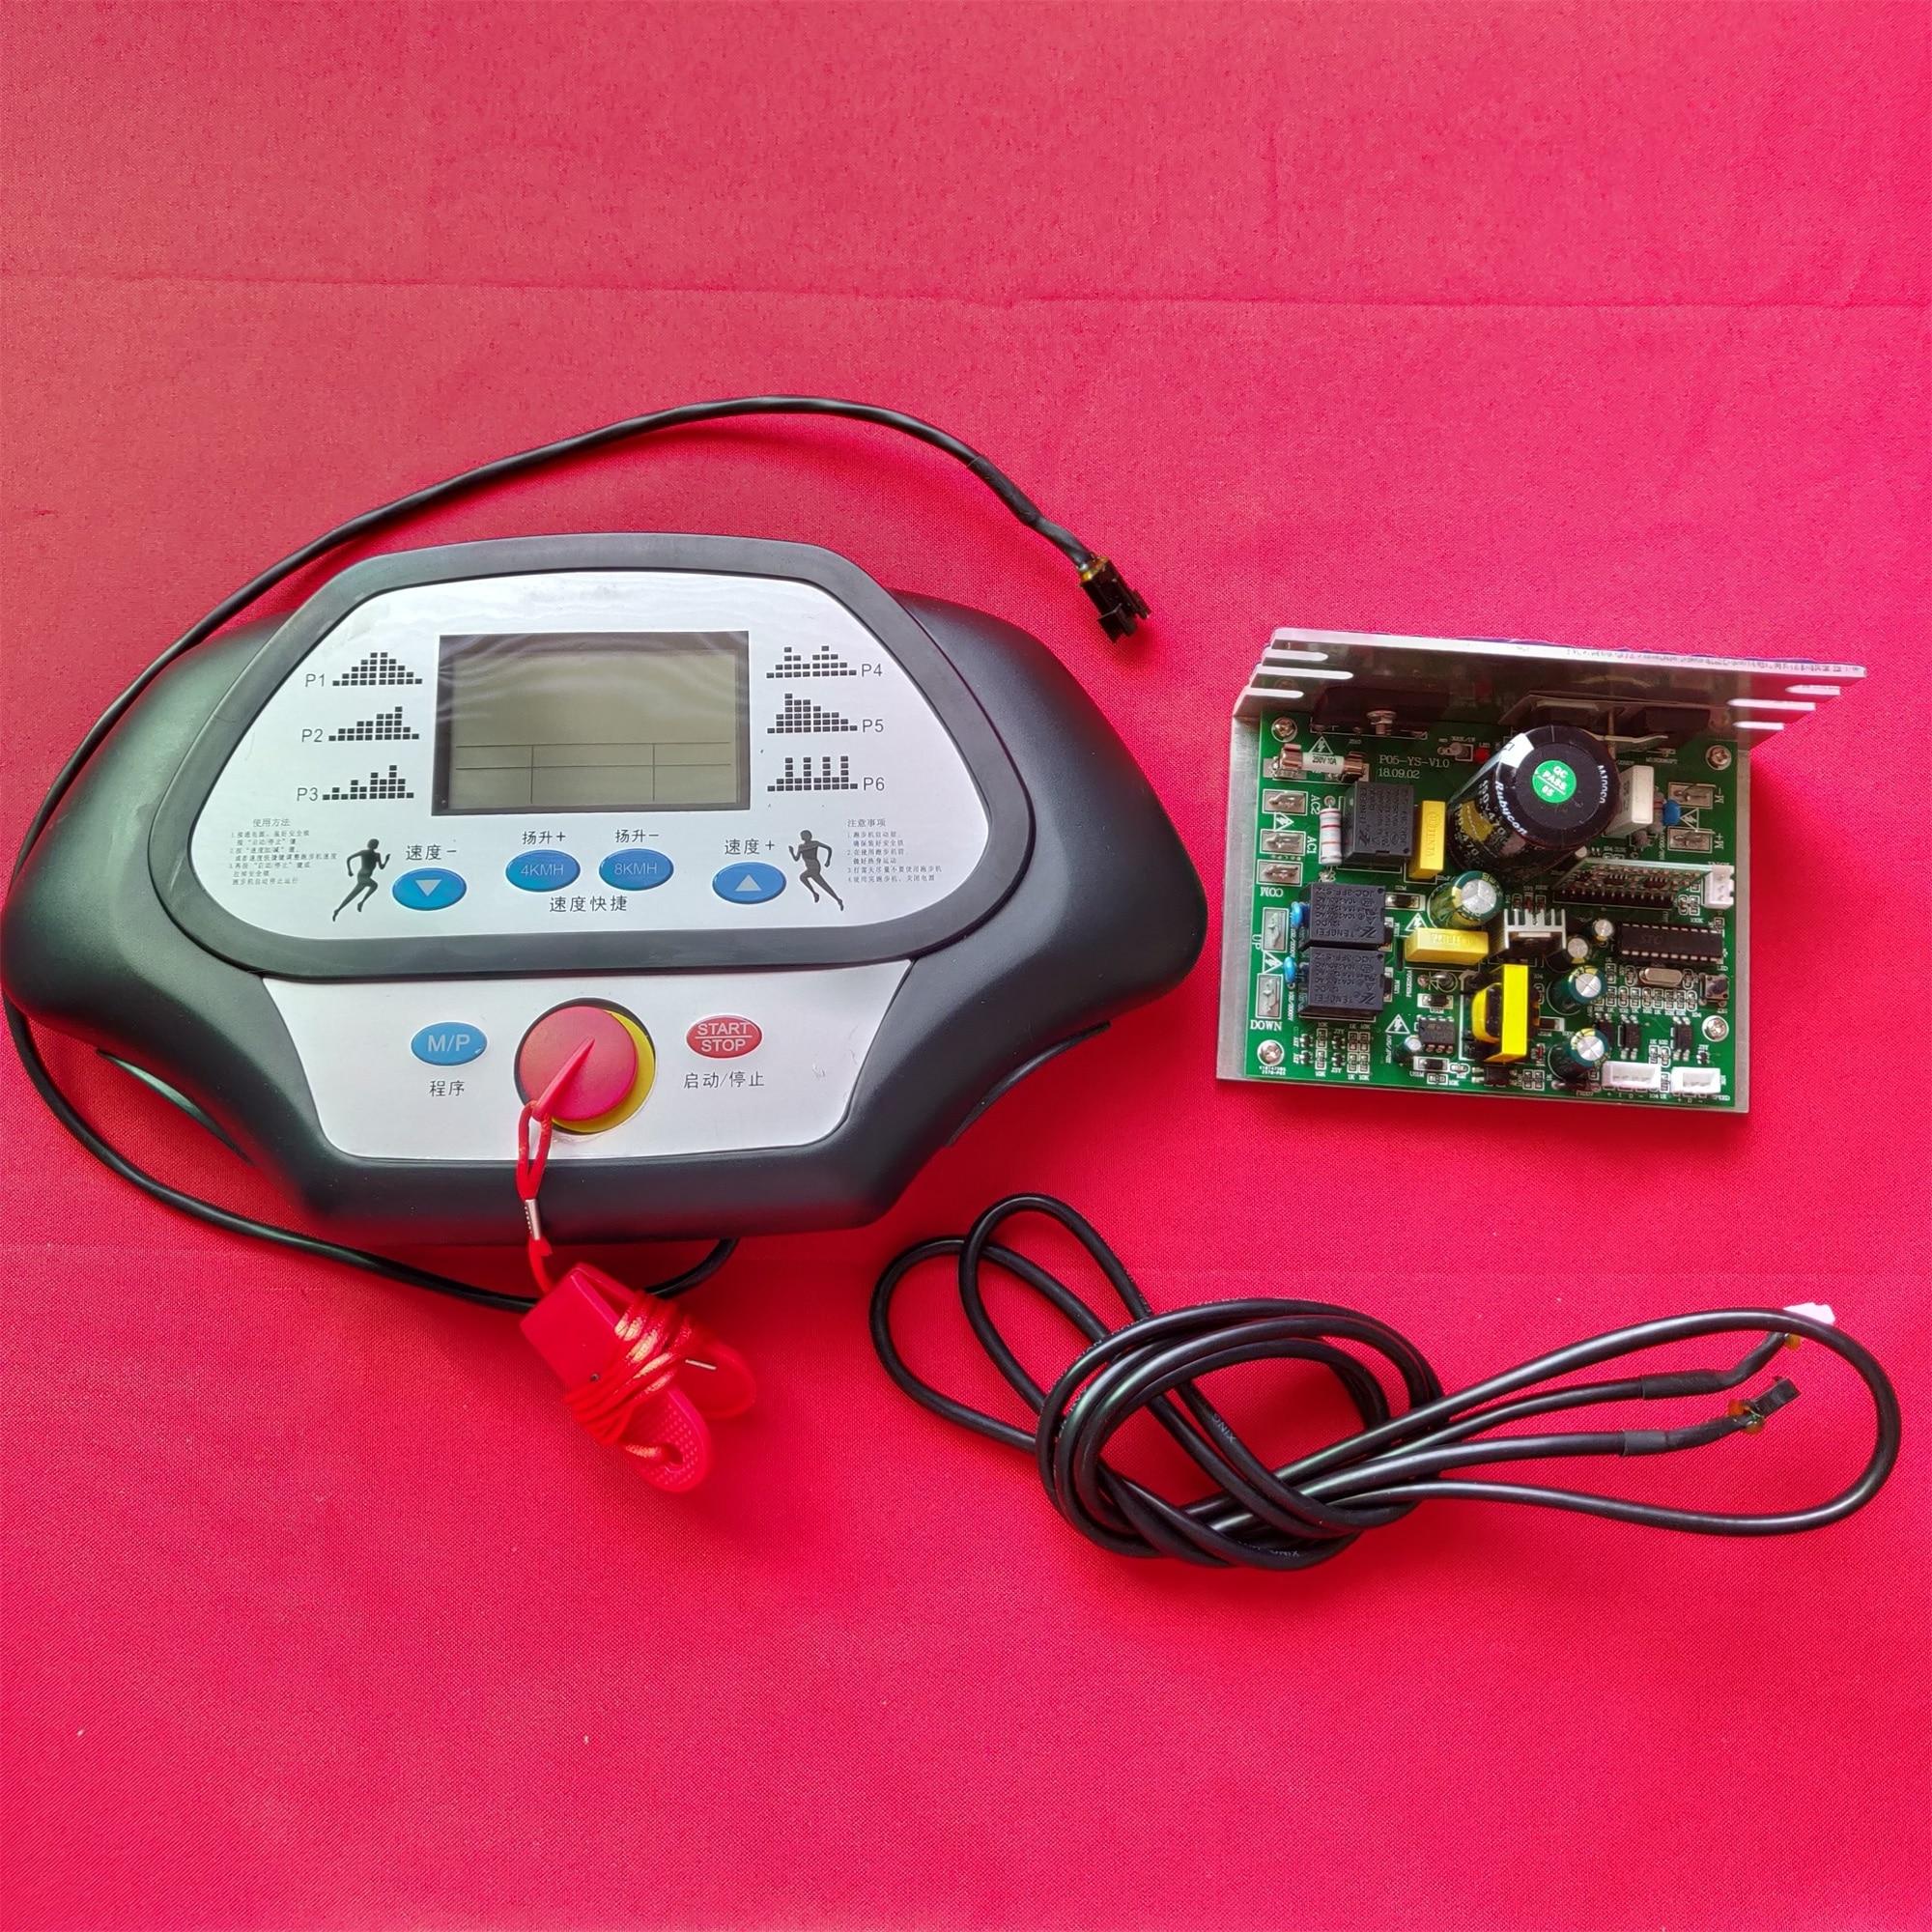 General use repair running machine controller display panel controller+treadmill instrument panel 1-2.0HP 1-4.0HP DC Motor